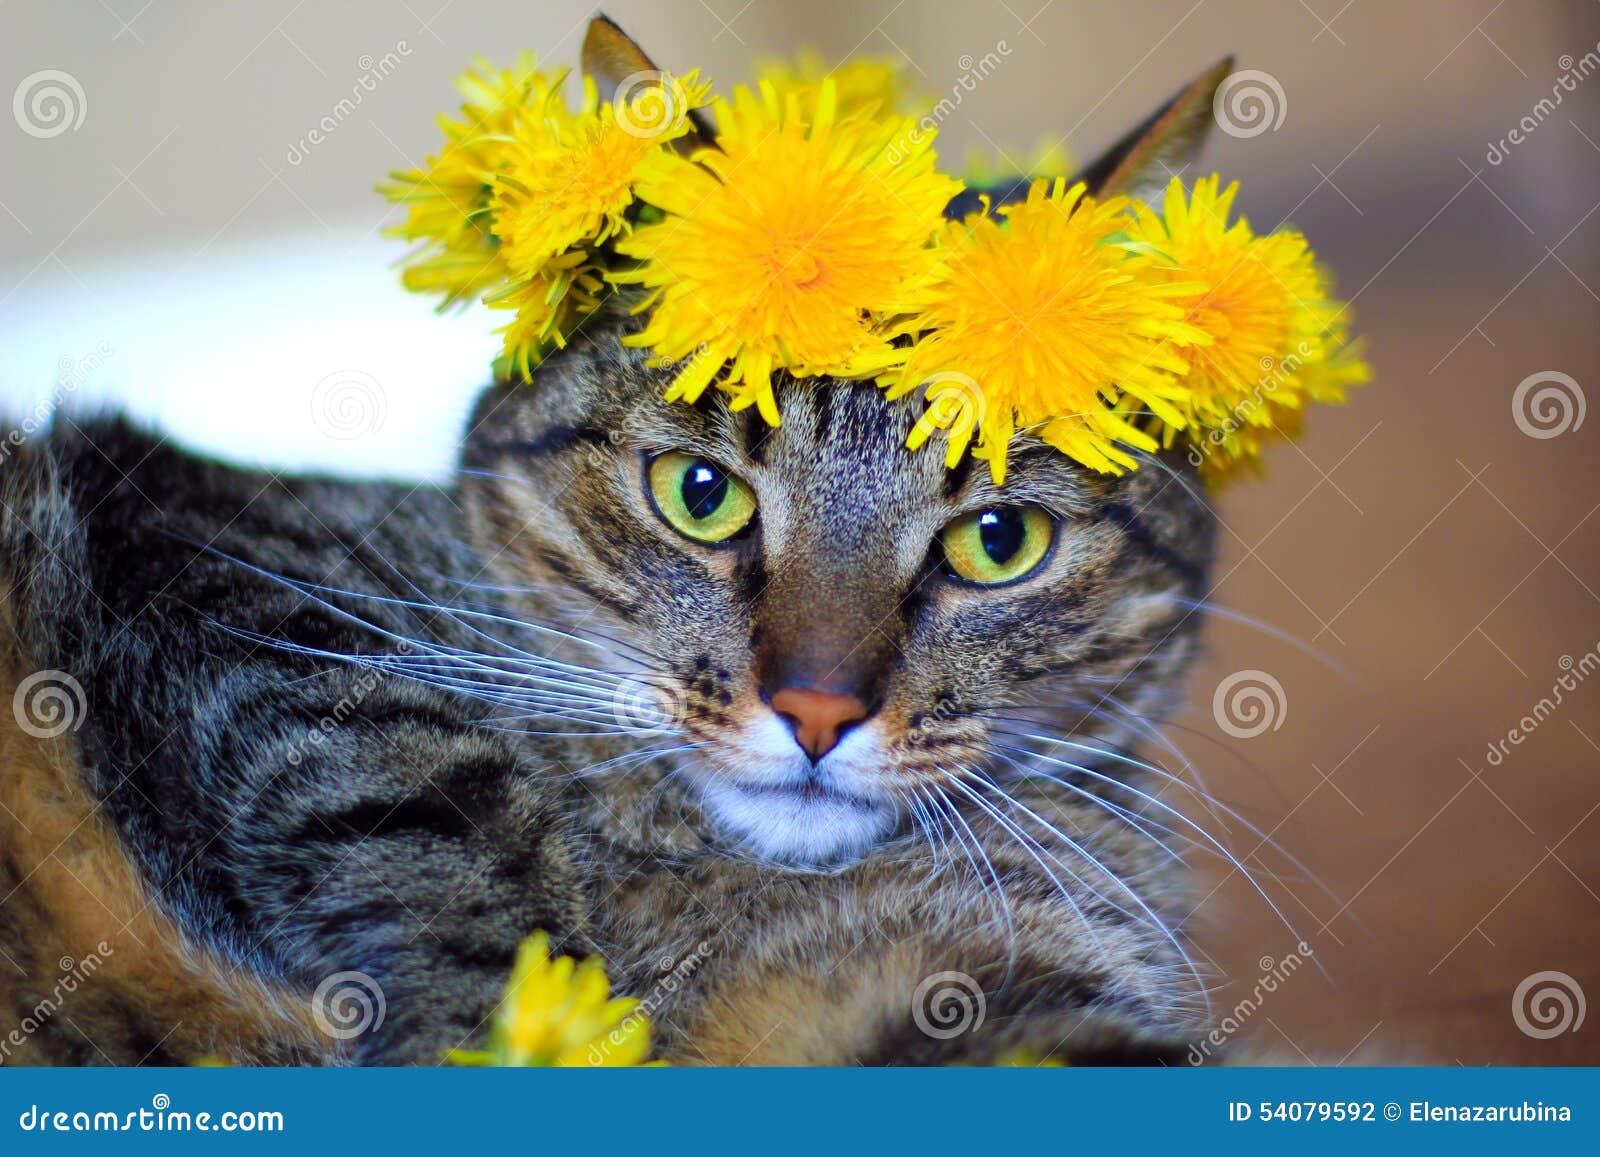 Cat Wearing Dandelions Flower Crown Stock Photo Image Of Yellow